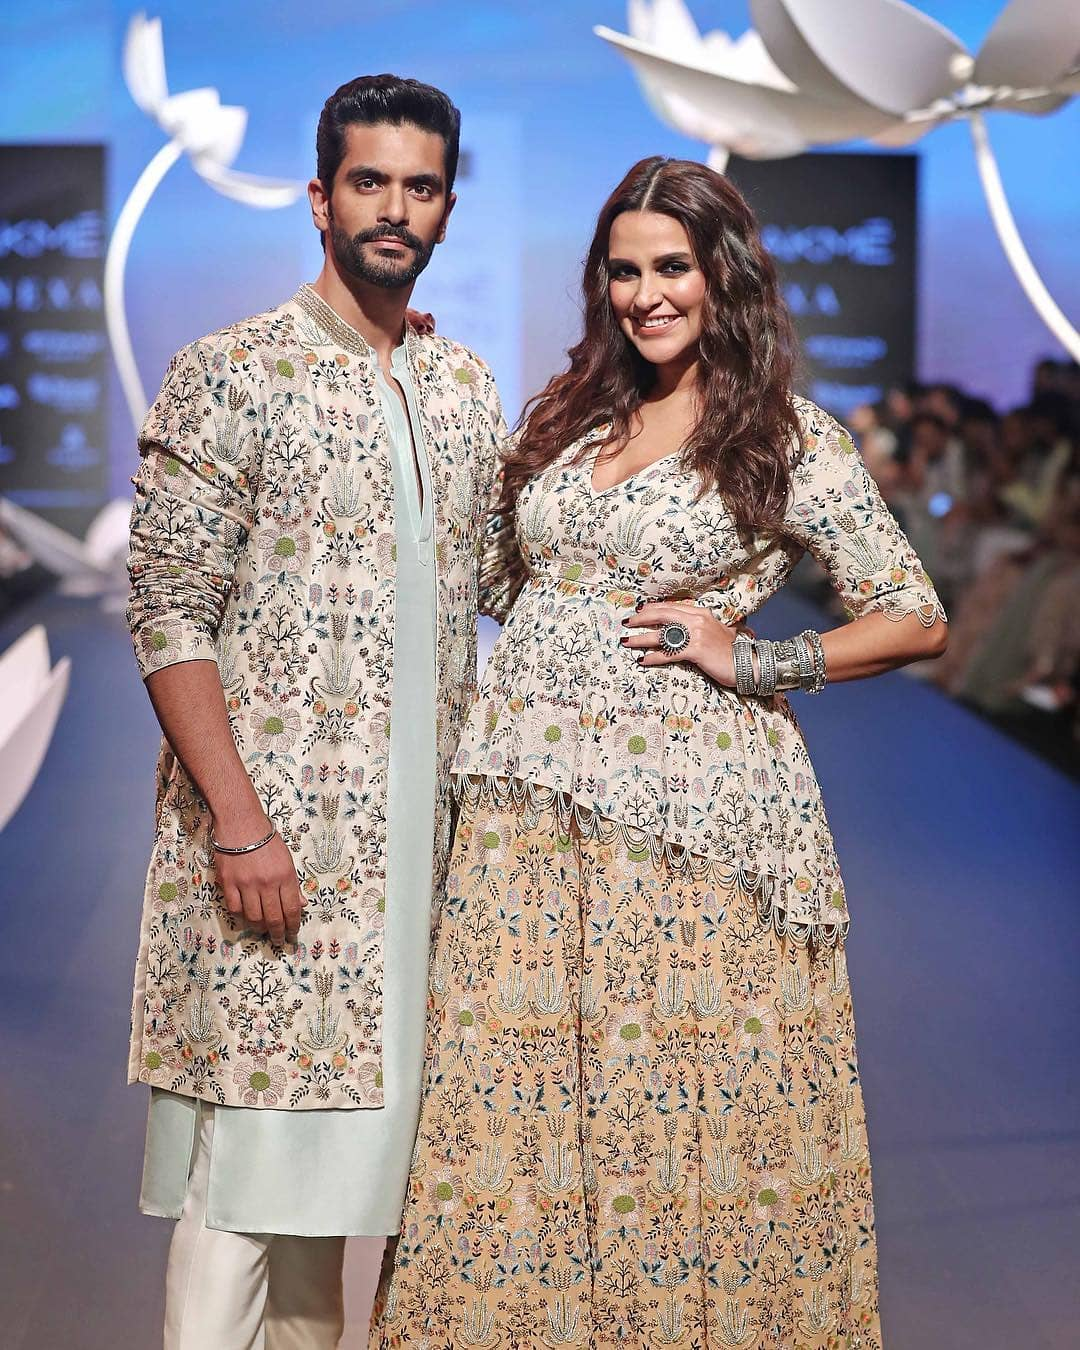 Lakme Fashion Week, angad bedi, neha dhupia, payal singhal